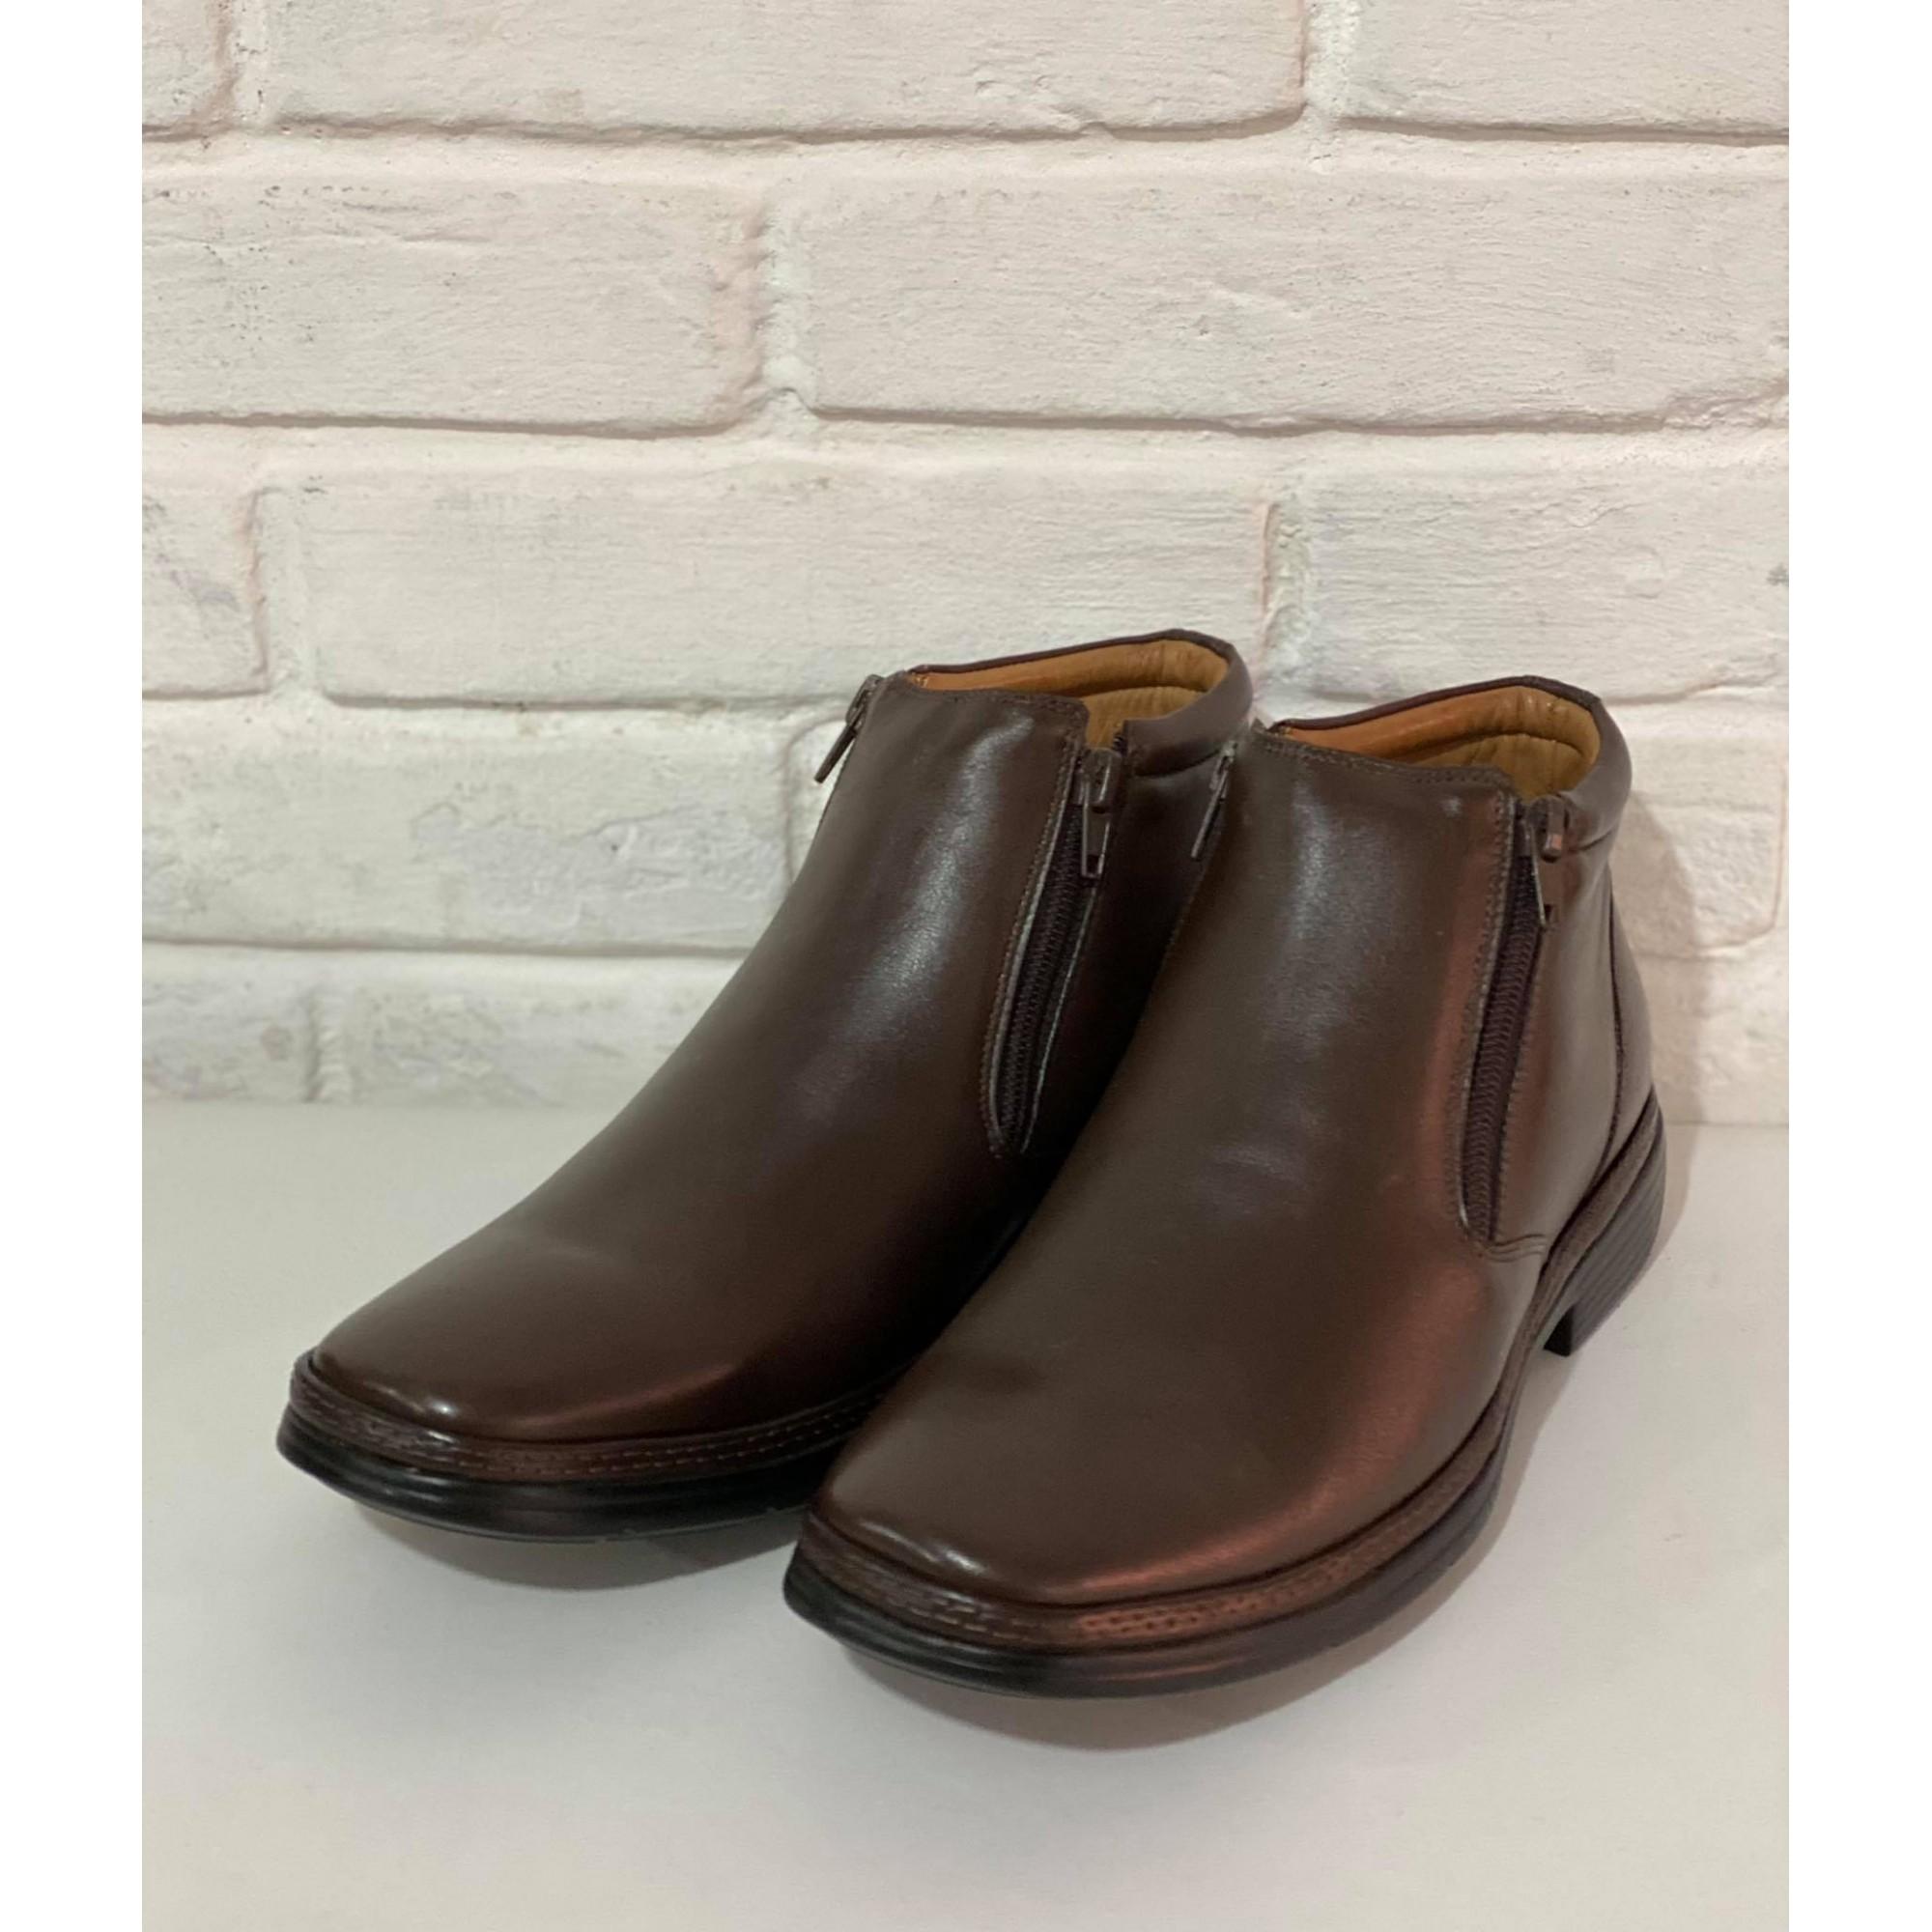 Sapato Masculino Anatomic Gel Mestiço Dark Brown Sola Ultraleve 1010826